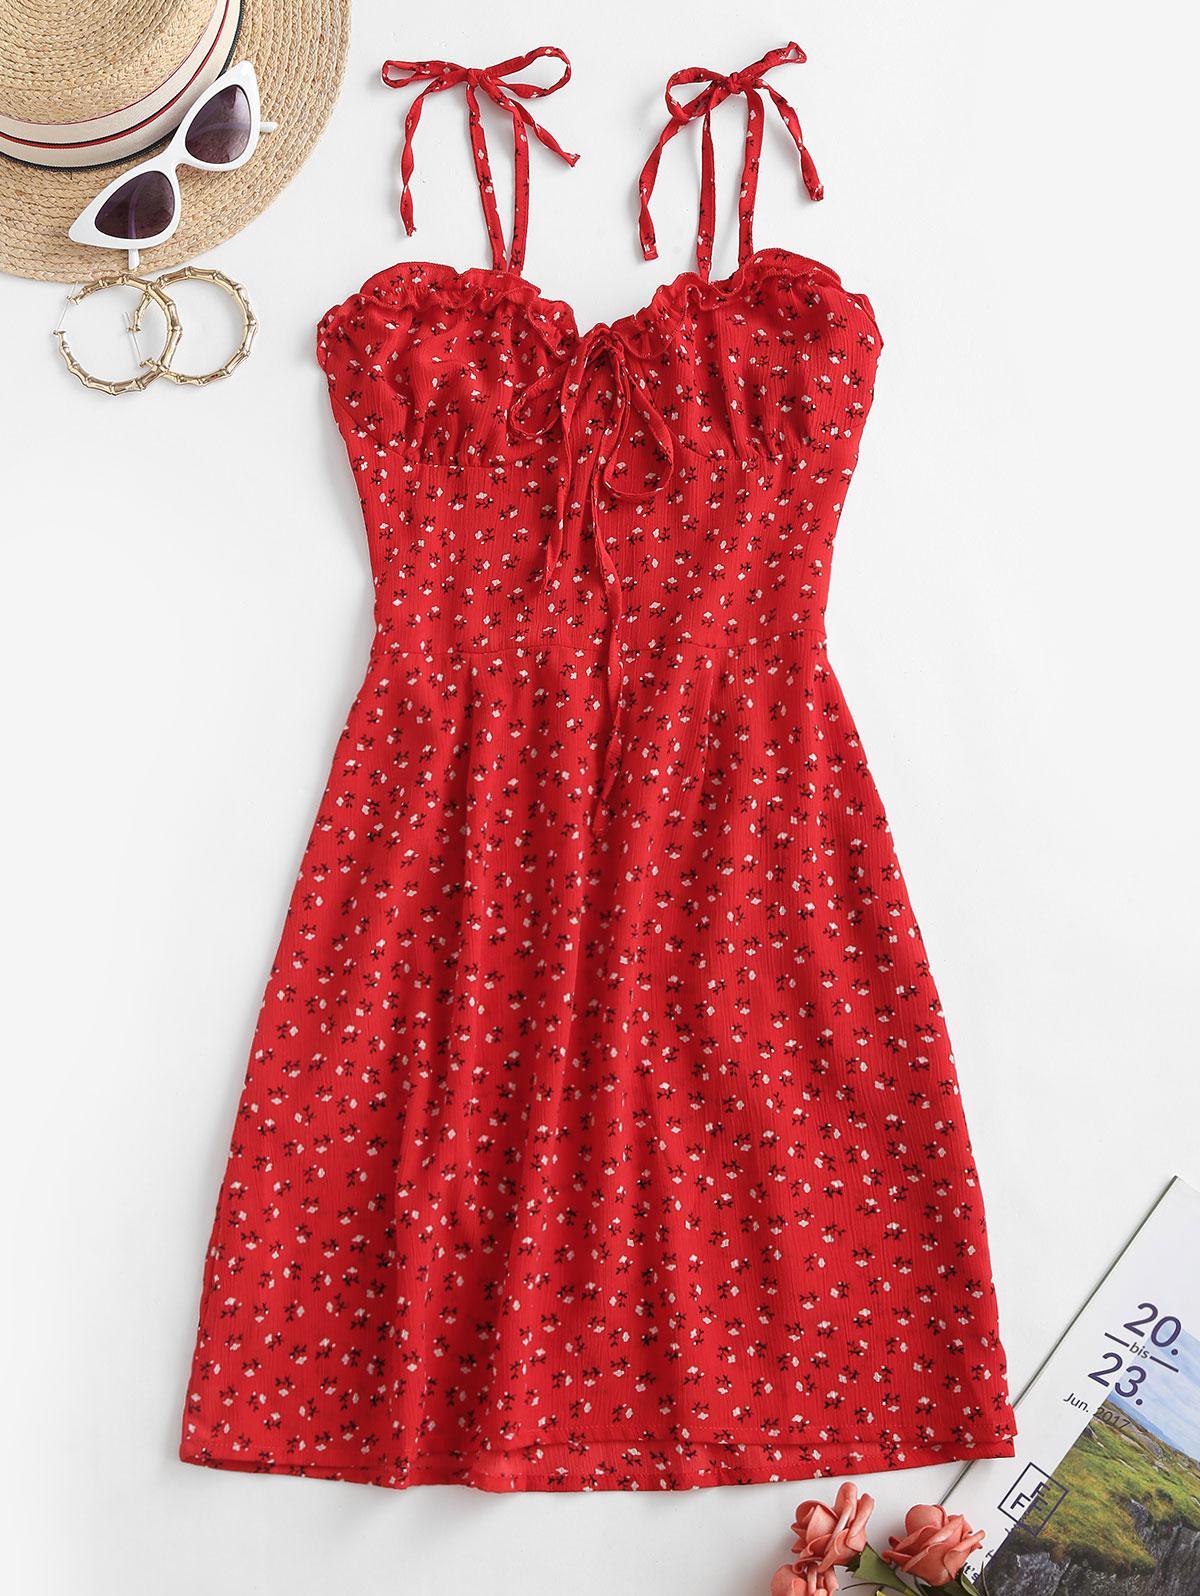 Tie Shoulder Ditsy Floral Lettuce Trim Mini Dress